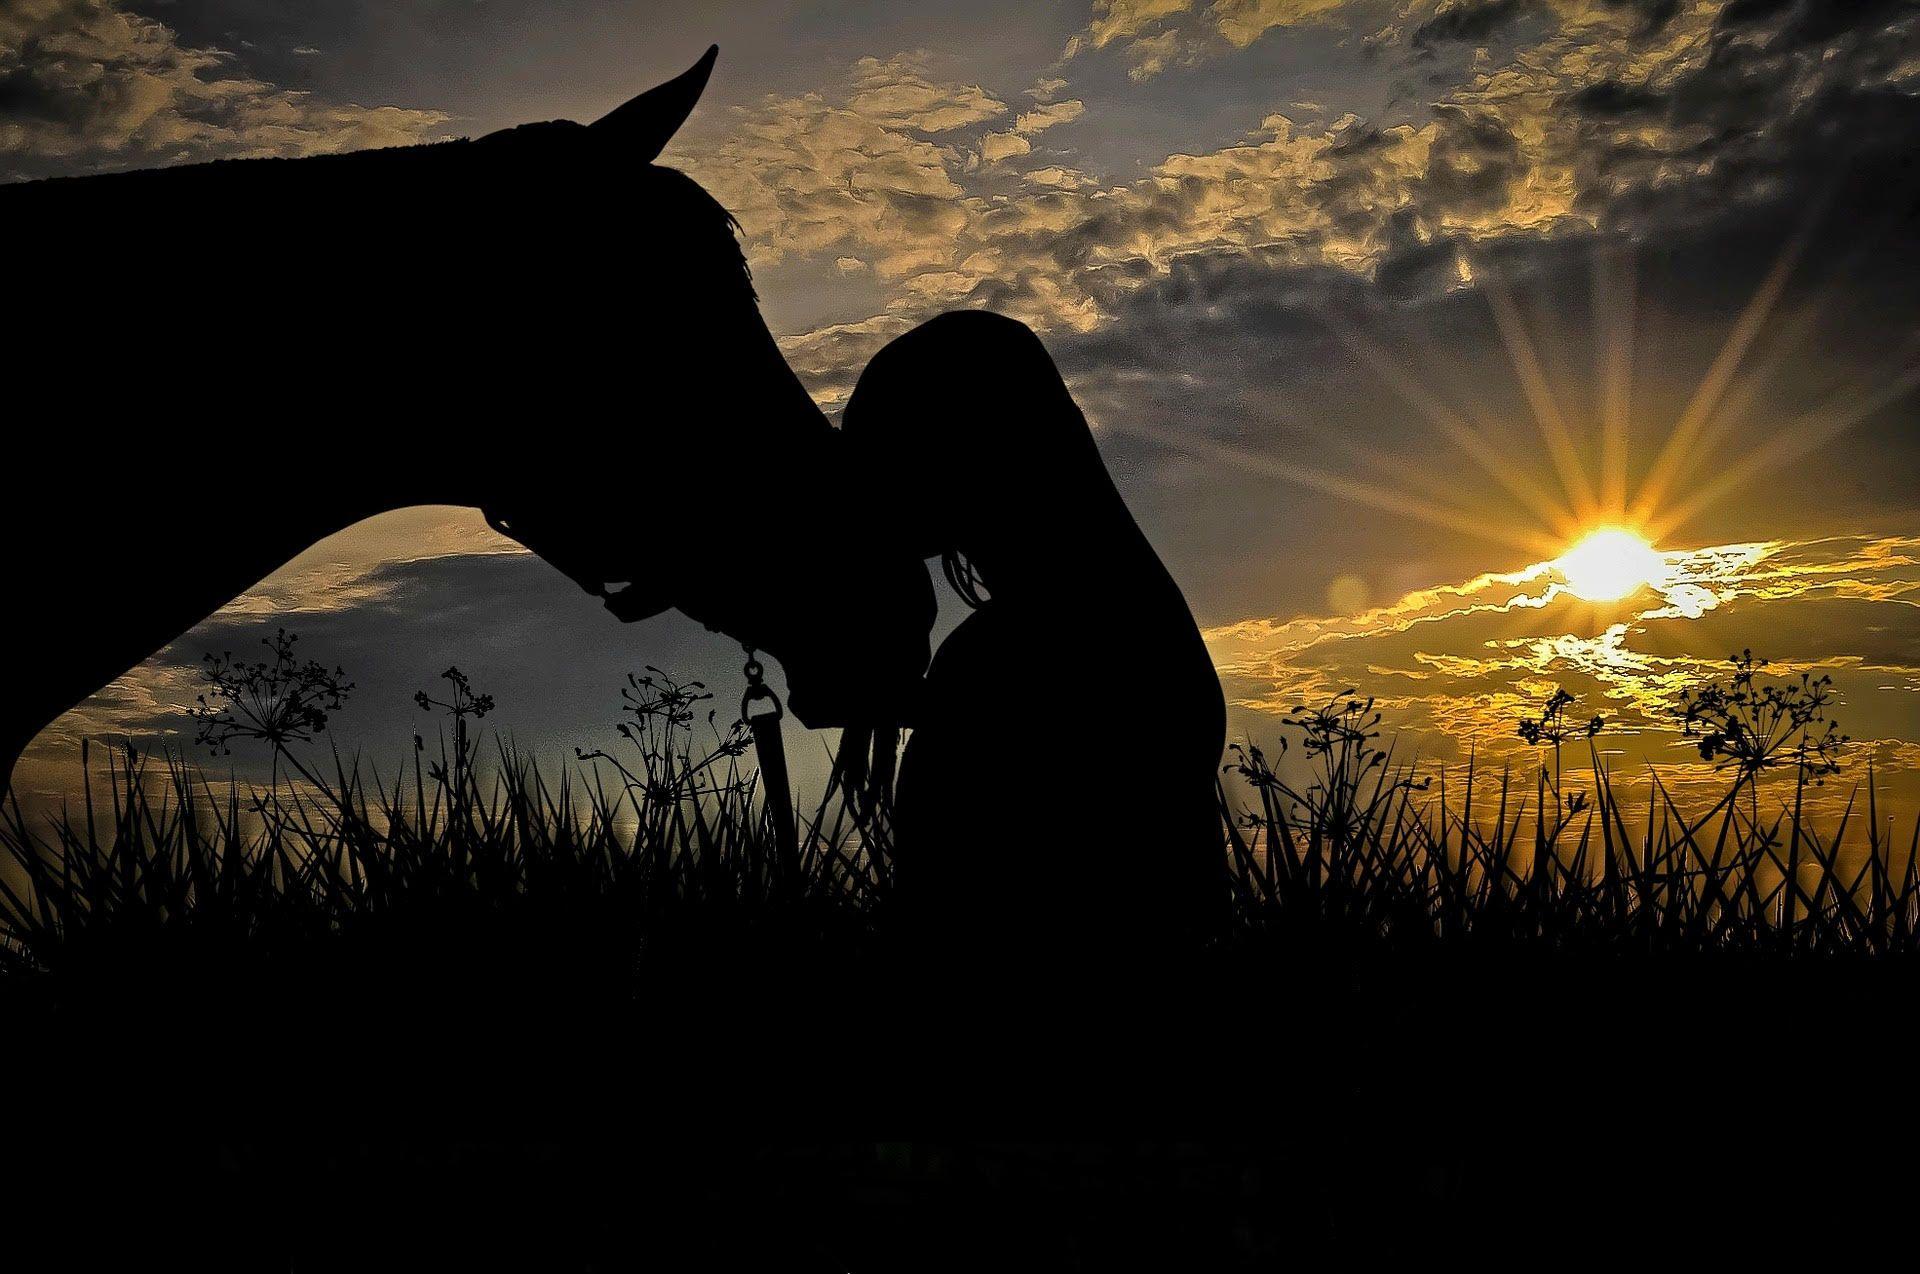 Di Snow - Equine Horse Naturopathy